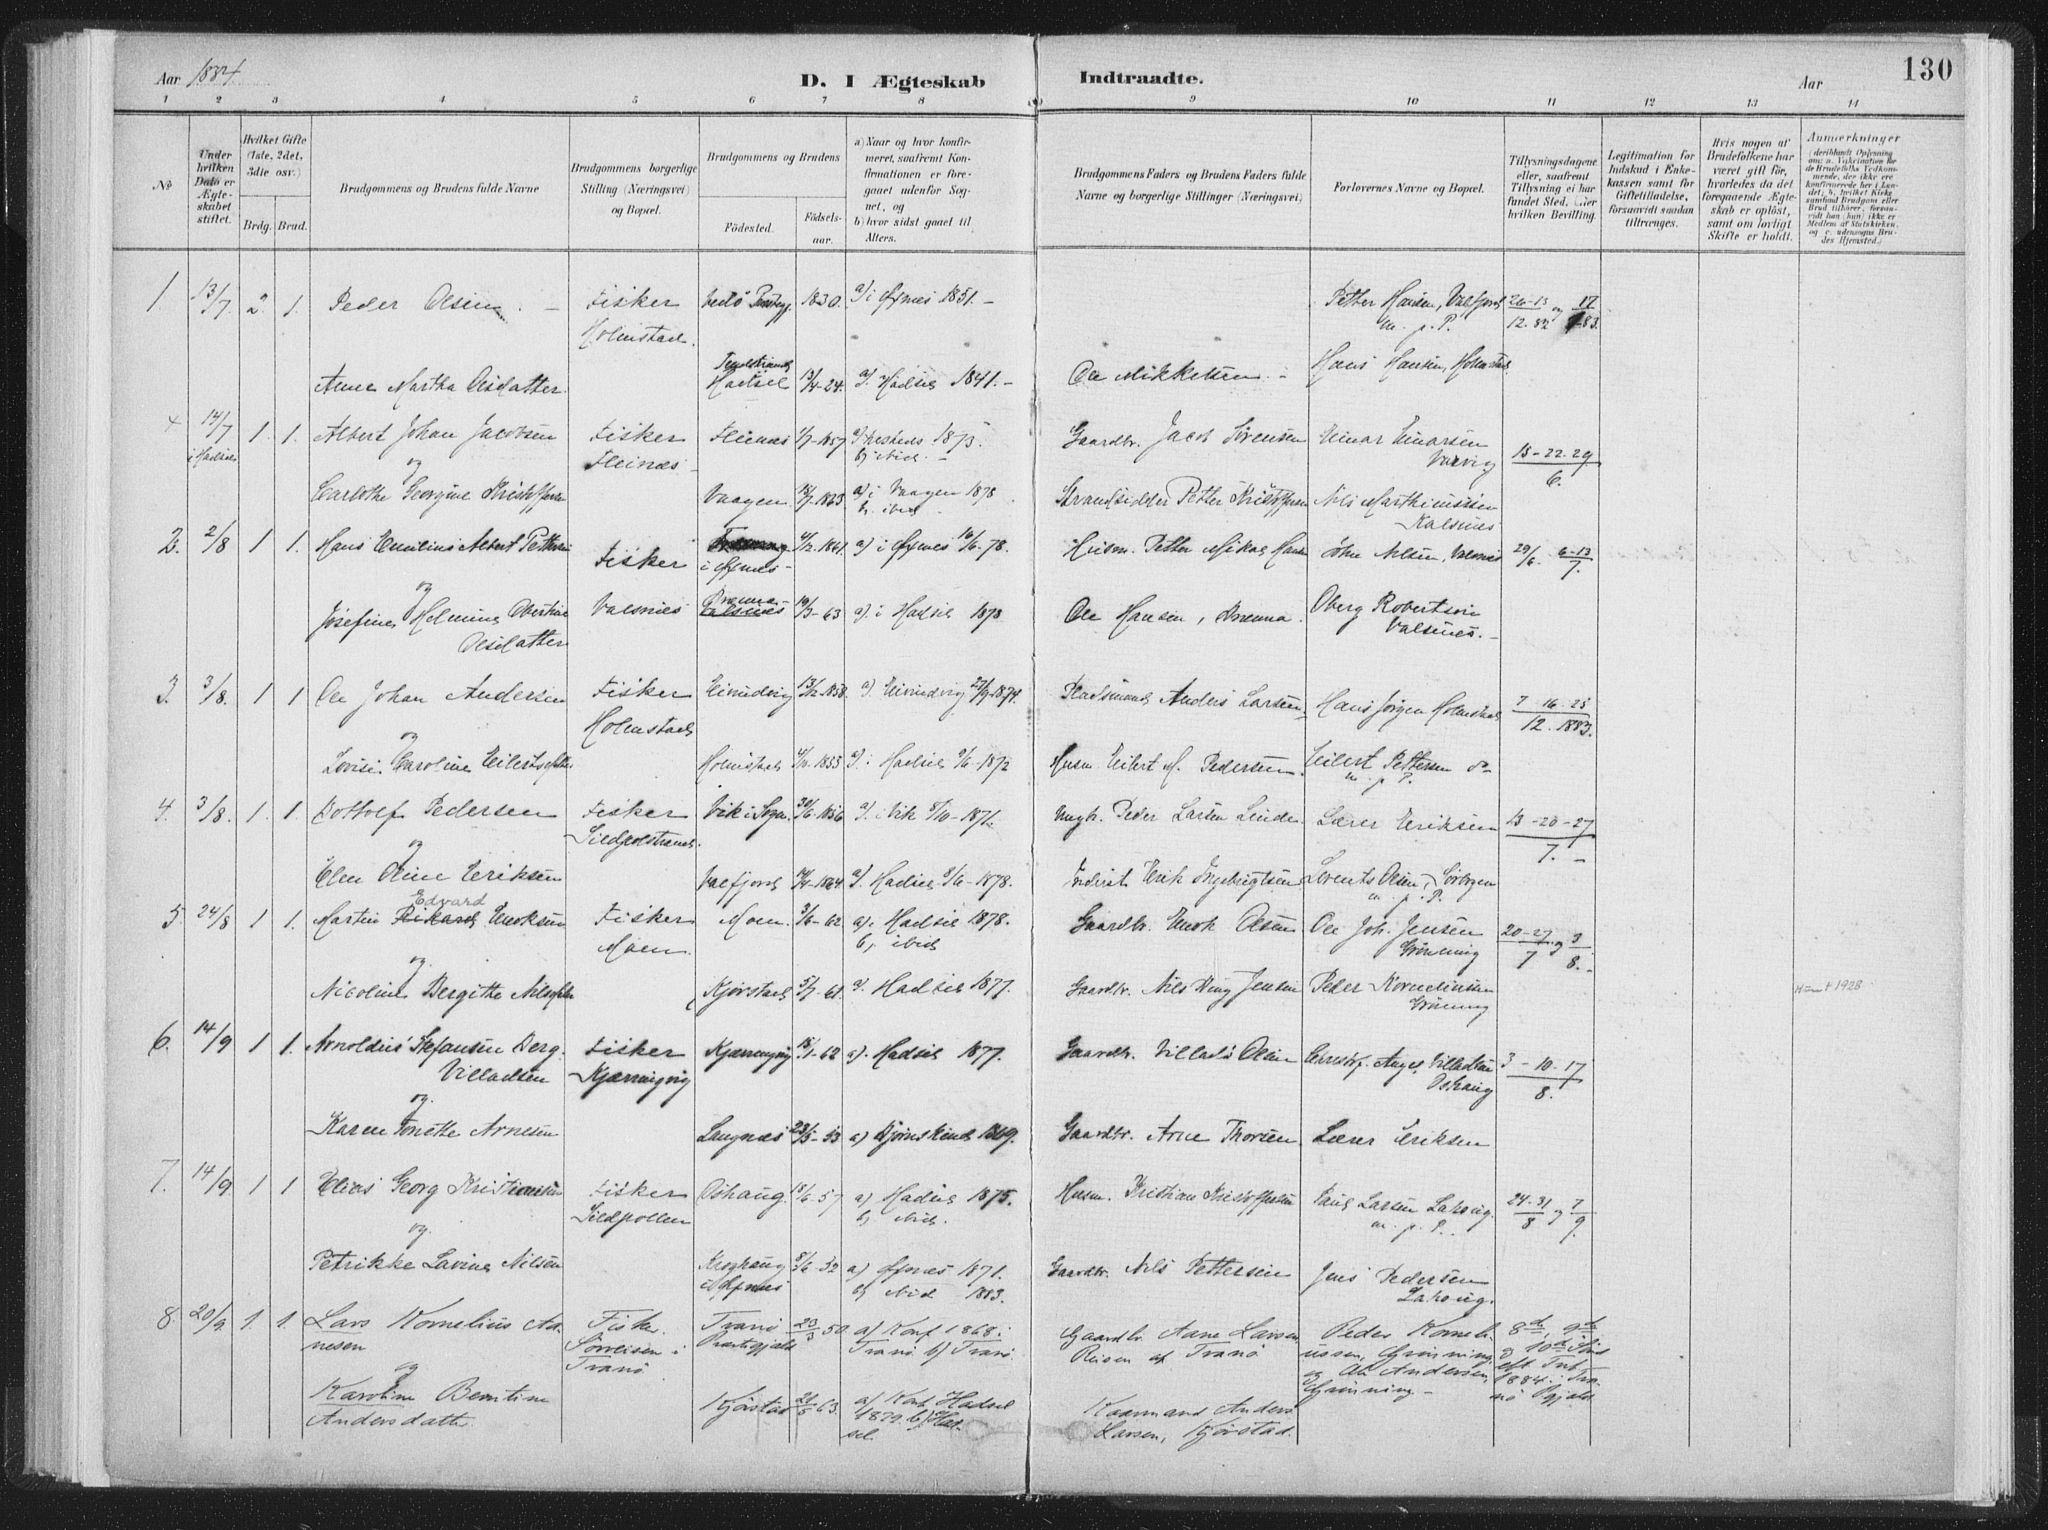 SAT, Ministerialprotokoller, klokkerbøker og fødselsregistre - Nordland, 890/L1286: Ministerialbok nr. 890A01, 1882-1902, s. 130